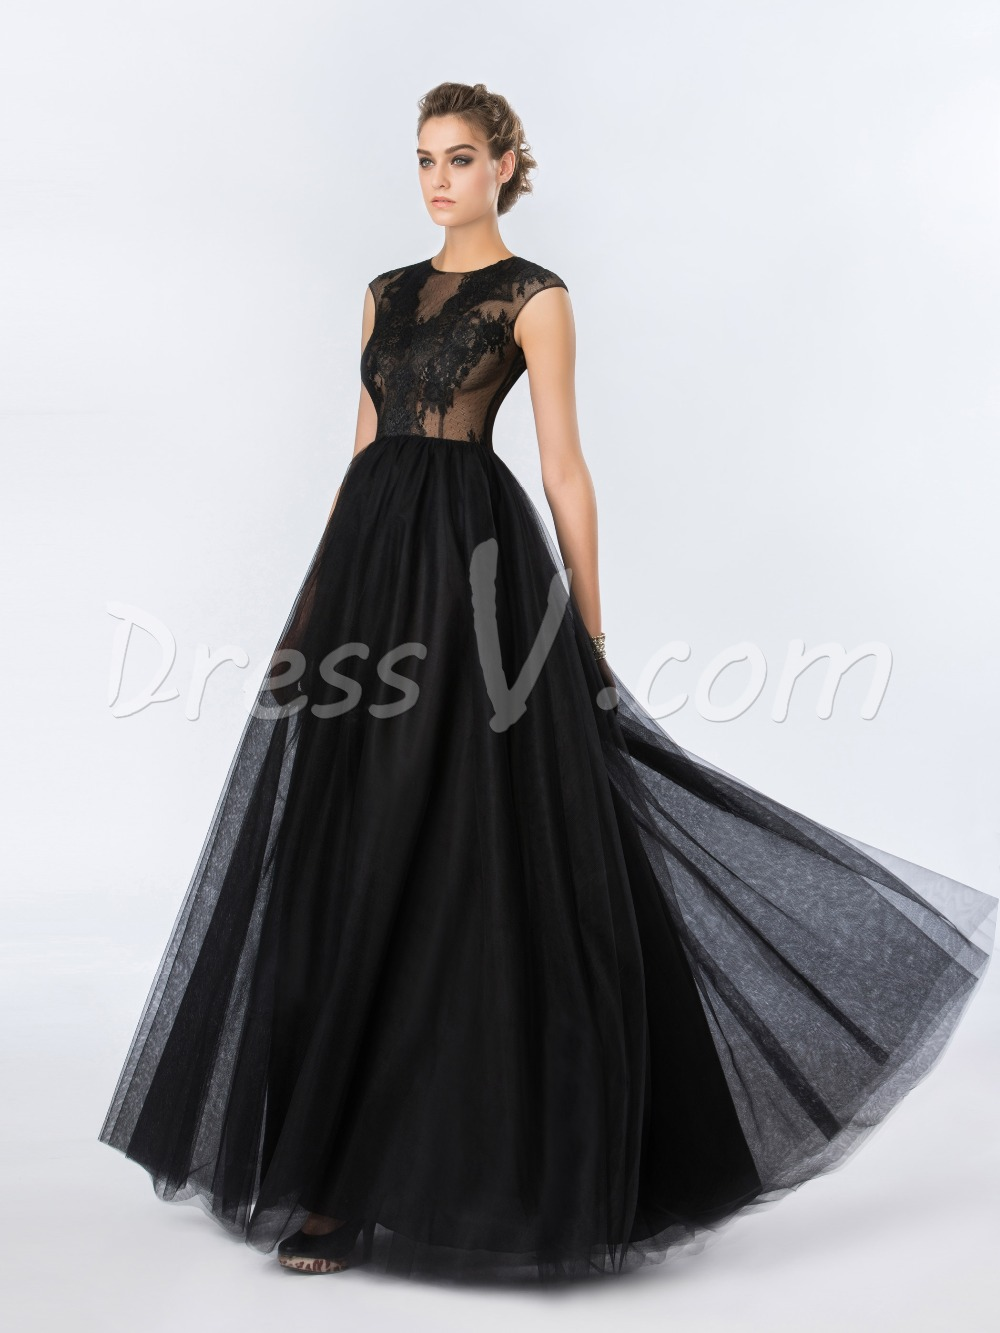 Long Black Evening Dresses 2016 Sheer Dot Net Lace Top Open Back ...